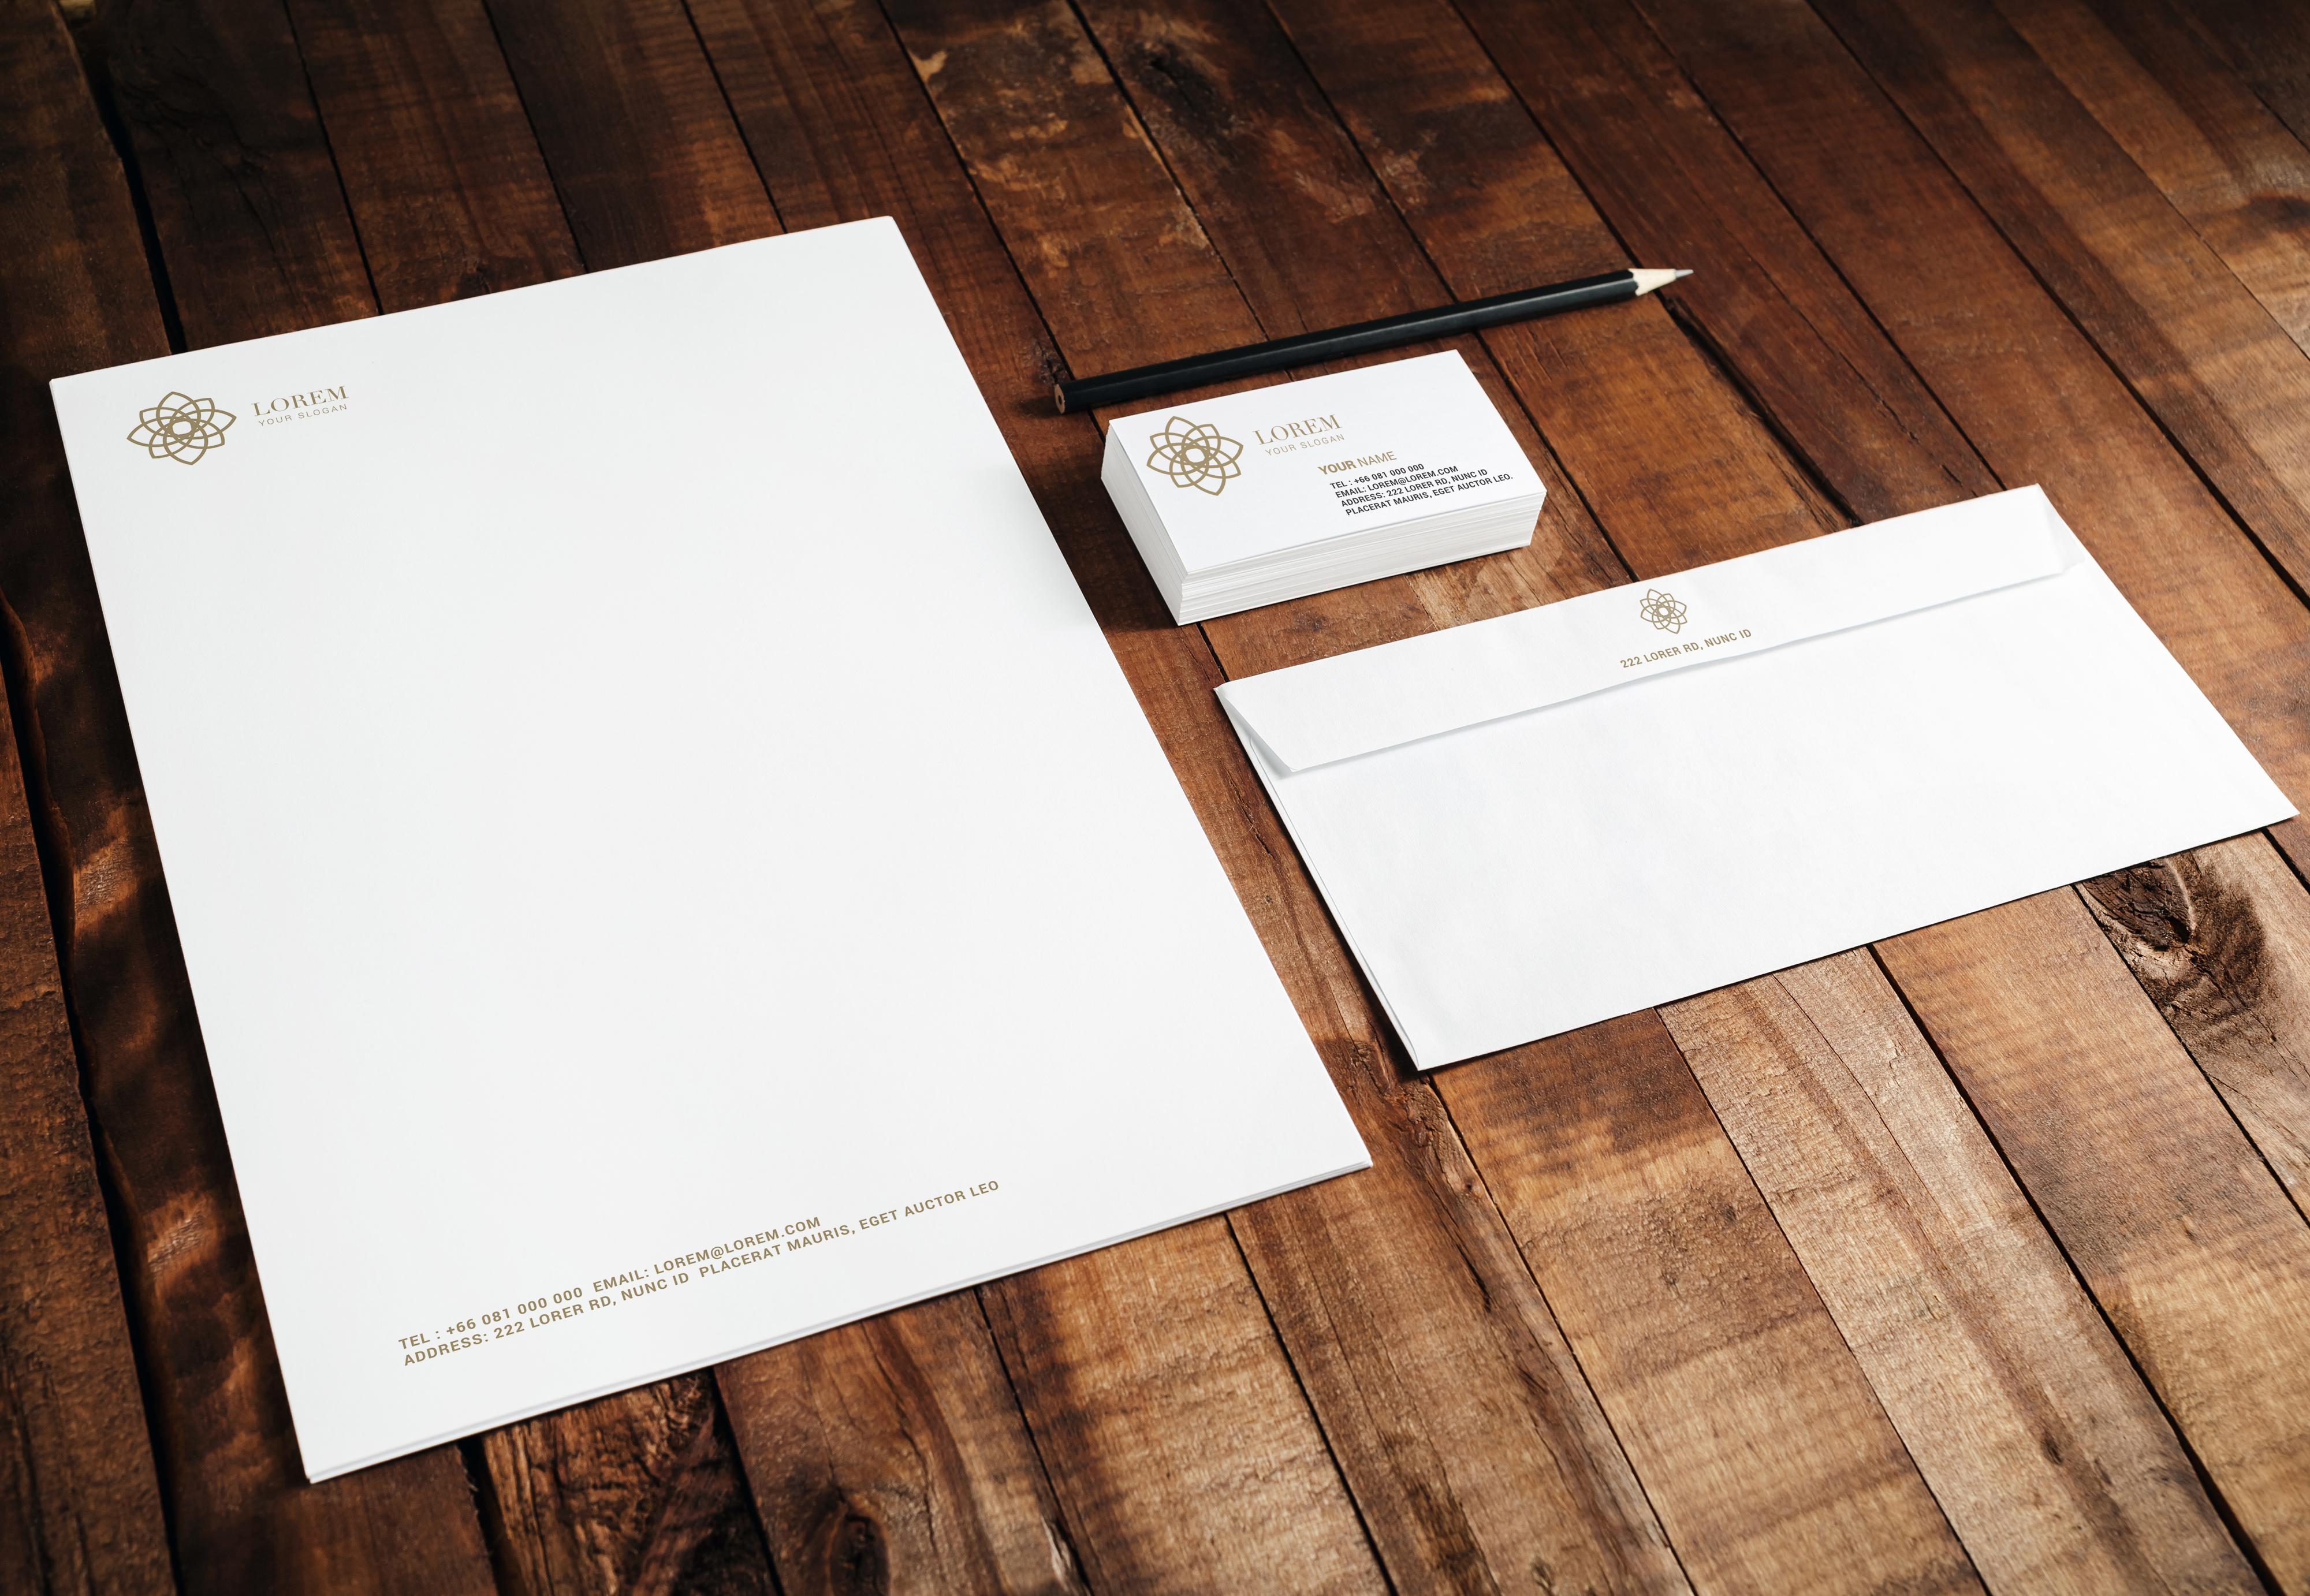 Custom printed corporate stationery package